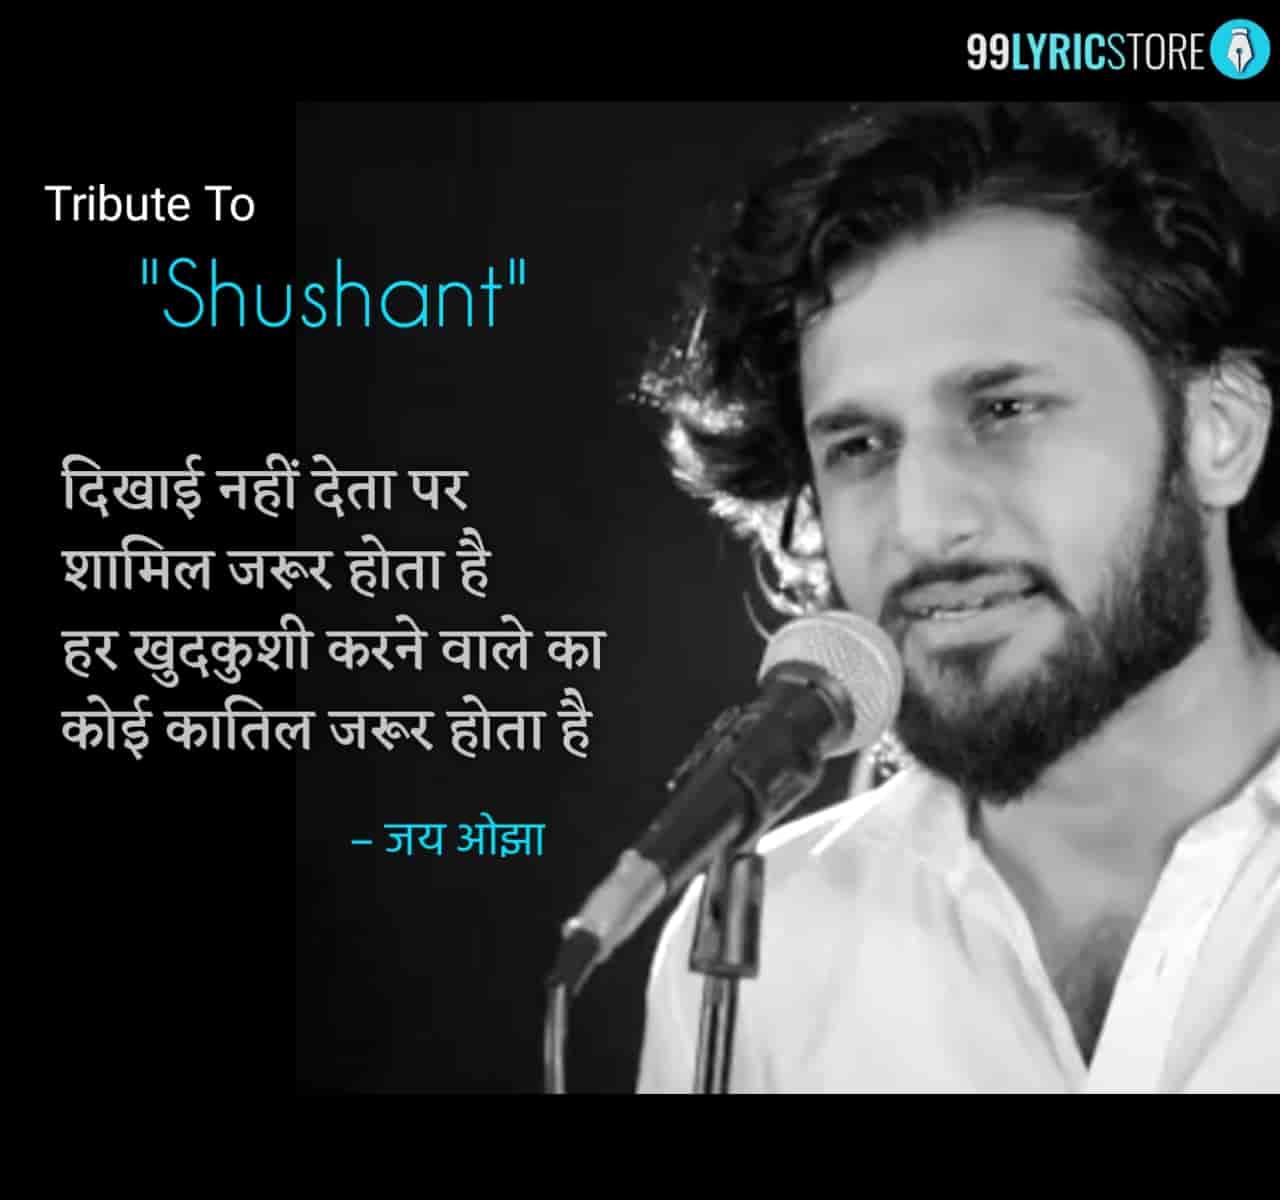 Yuhi Marta Nahi Koi Poetry By Jai Ojha Tribute to Sushant Singh Rajput